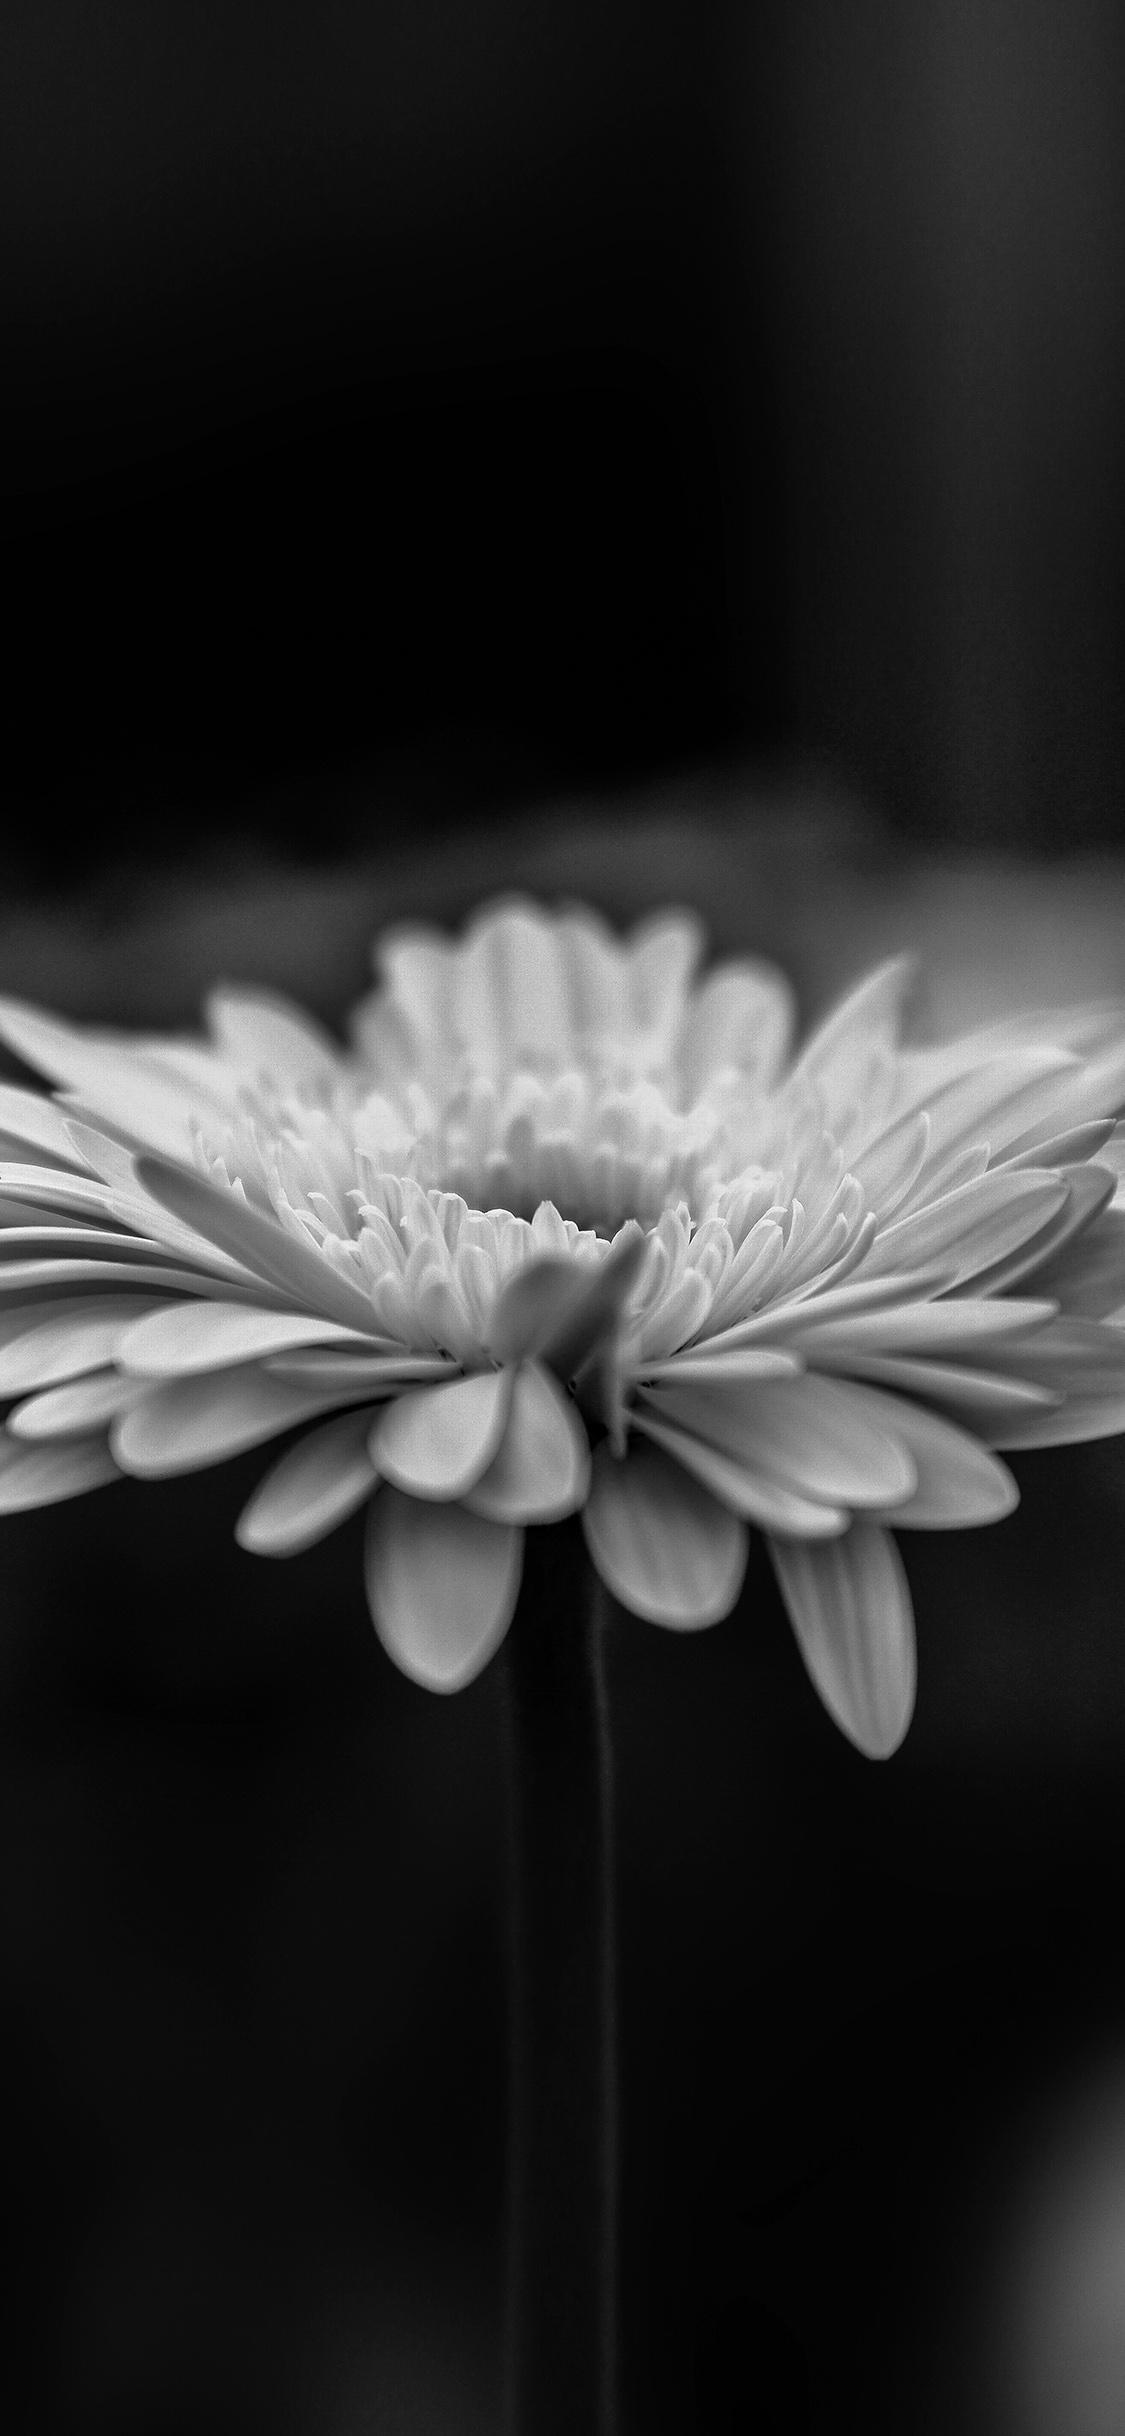 iPhonexpapers.com-Apple-iPhone-wallpaper-my64-flower-calm-nature-bw-dark